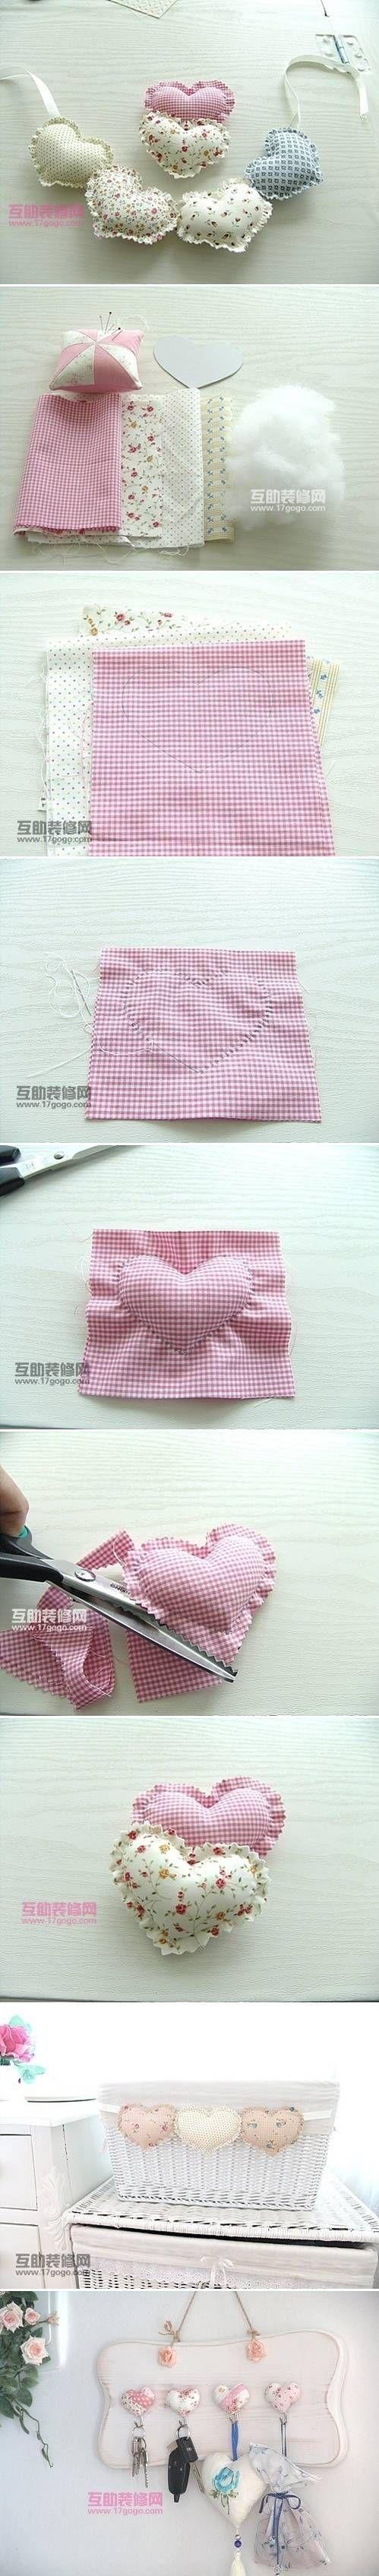 Fabric Heart Pendant DIY Fabric Heart Pendant